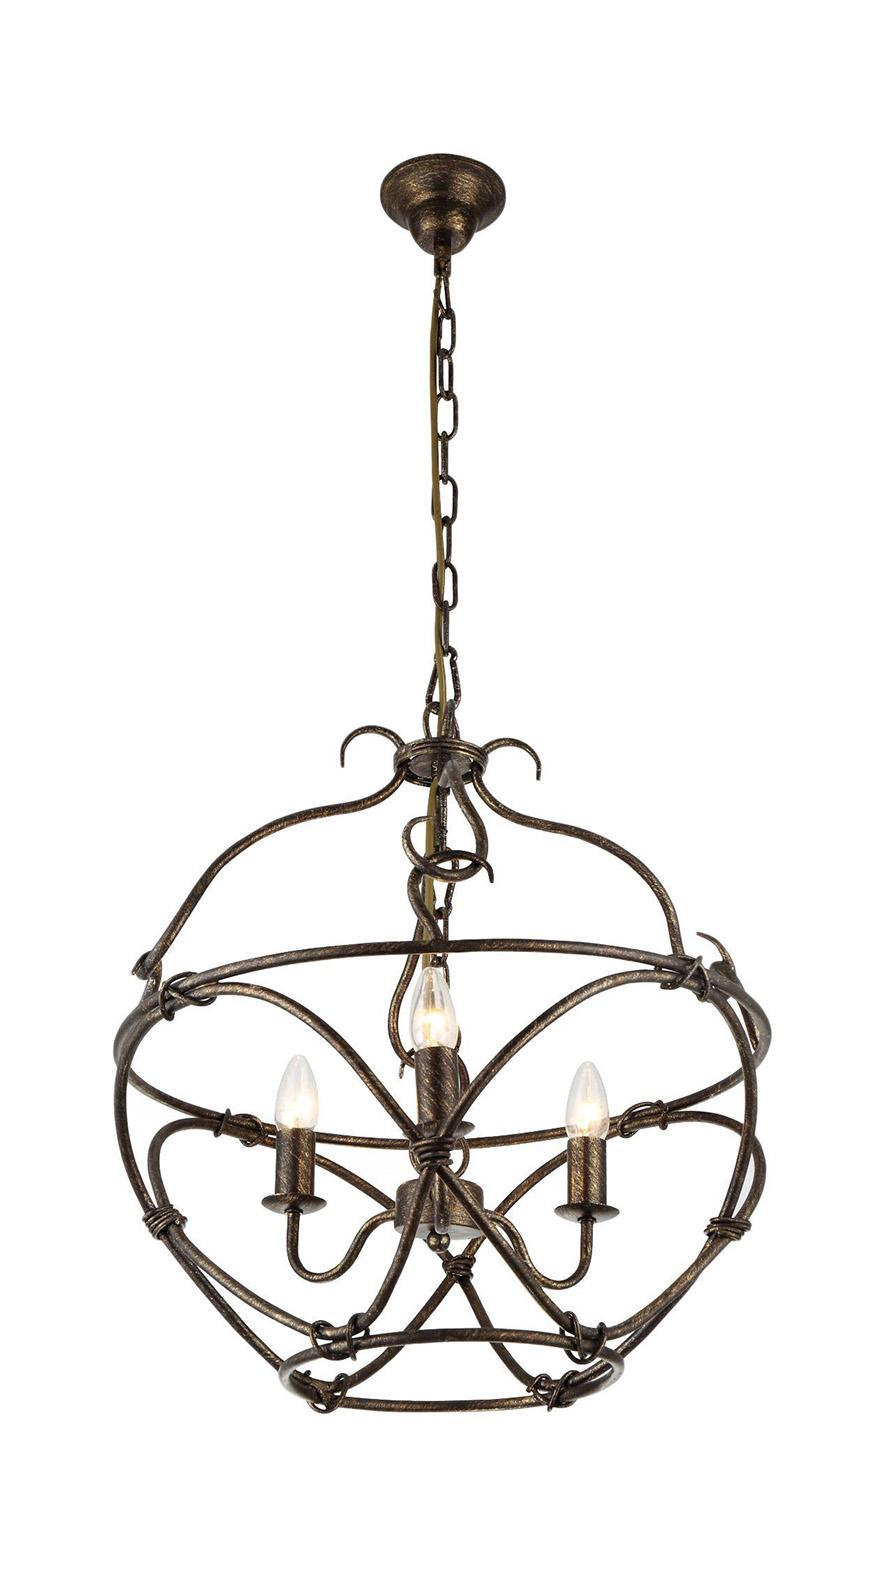 Светильник подвесной Arte lamp A8960sp-3ga arte lamp a8960sp 3ga